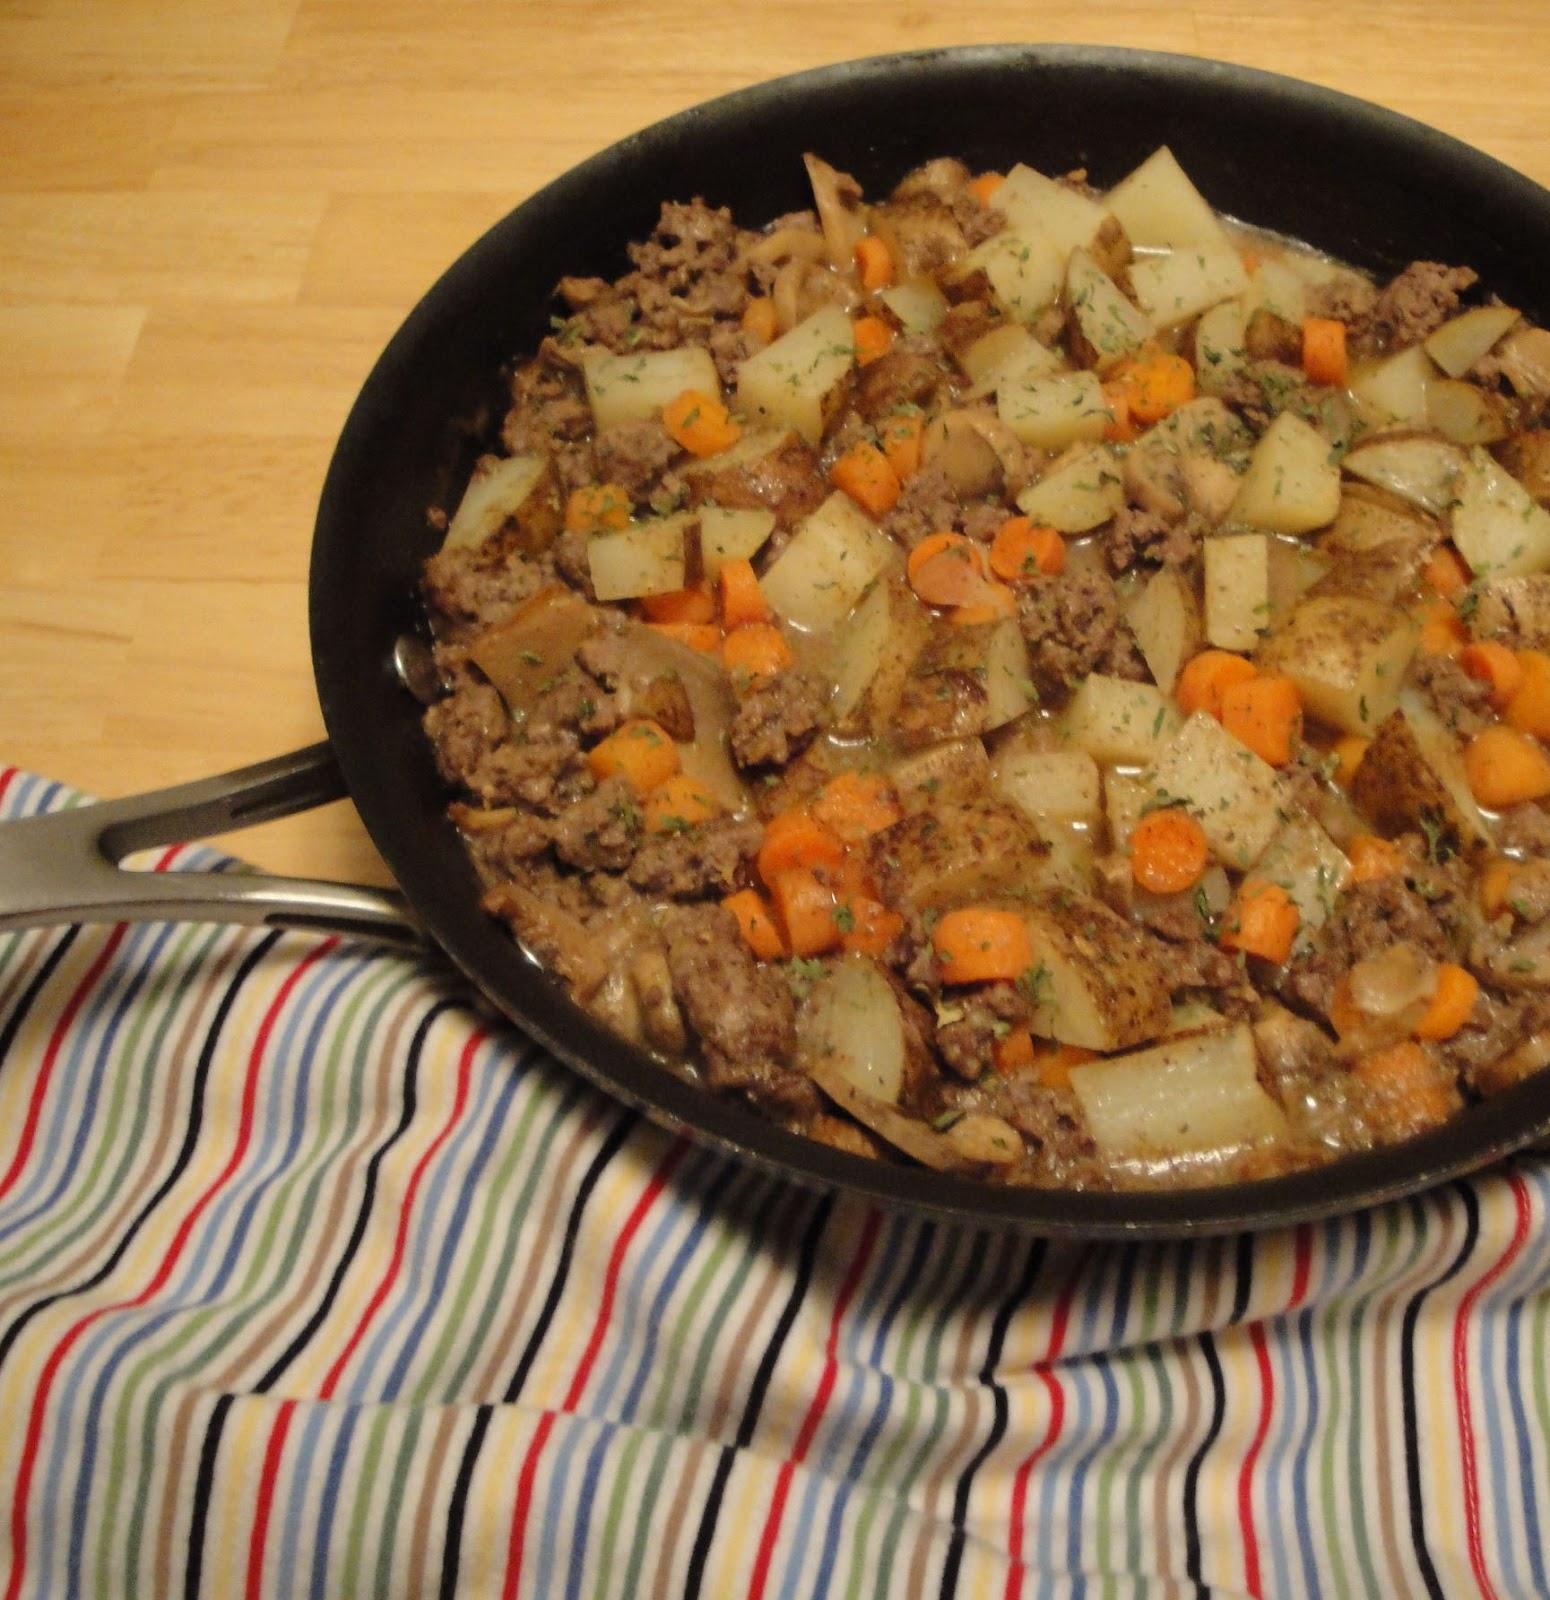 Christine's Pantry: 11 Easy Skillet Meals